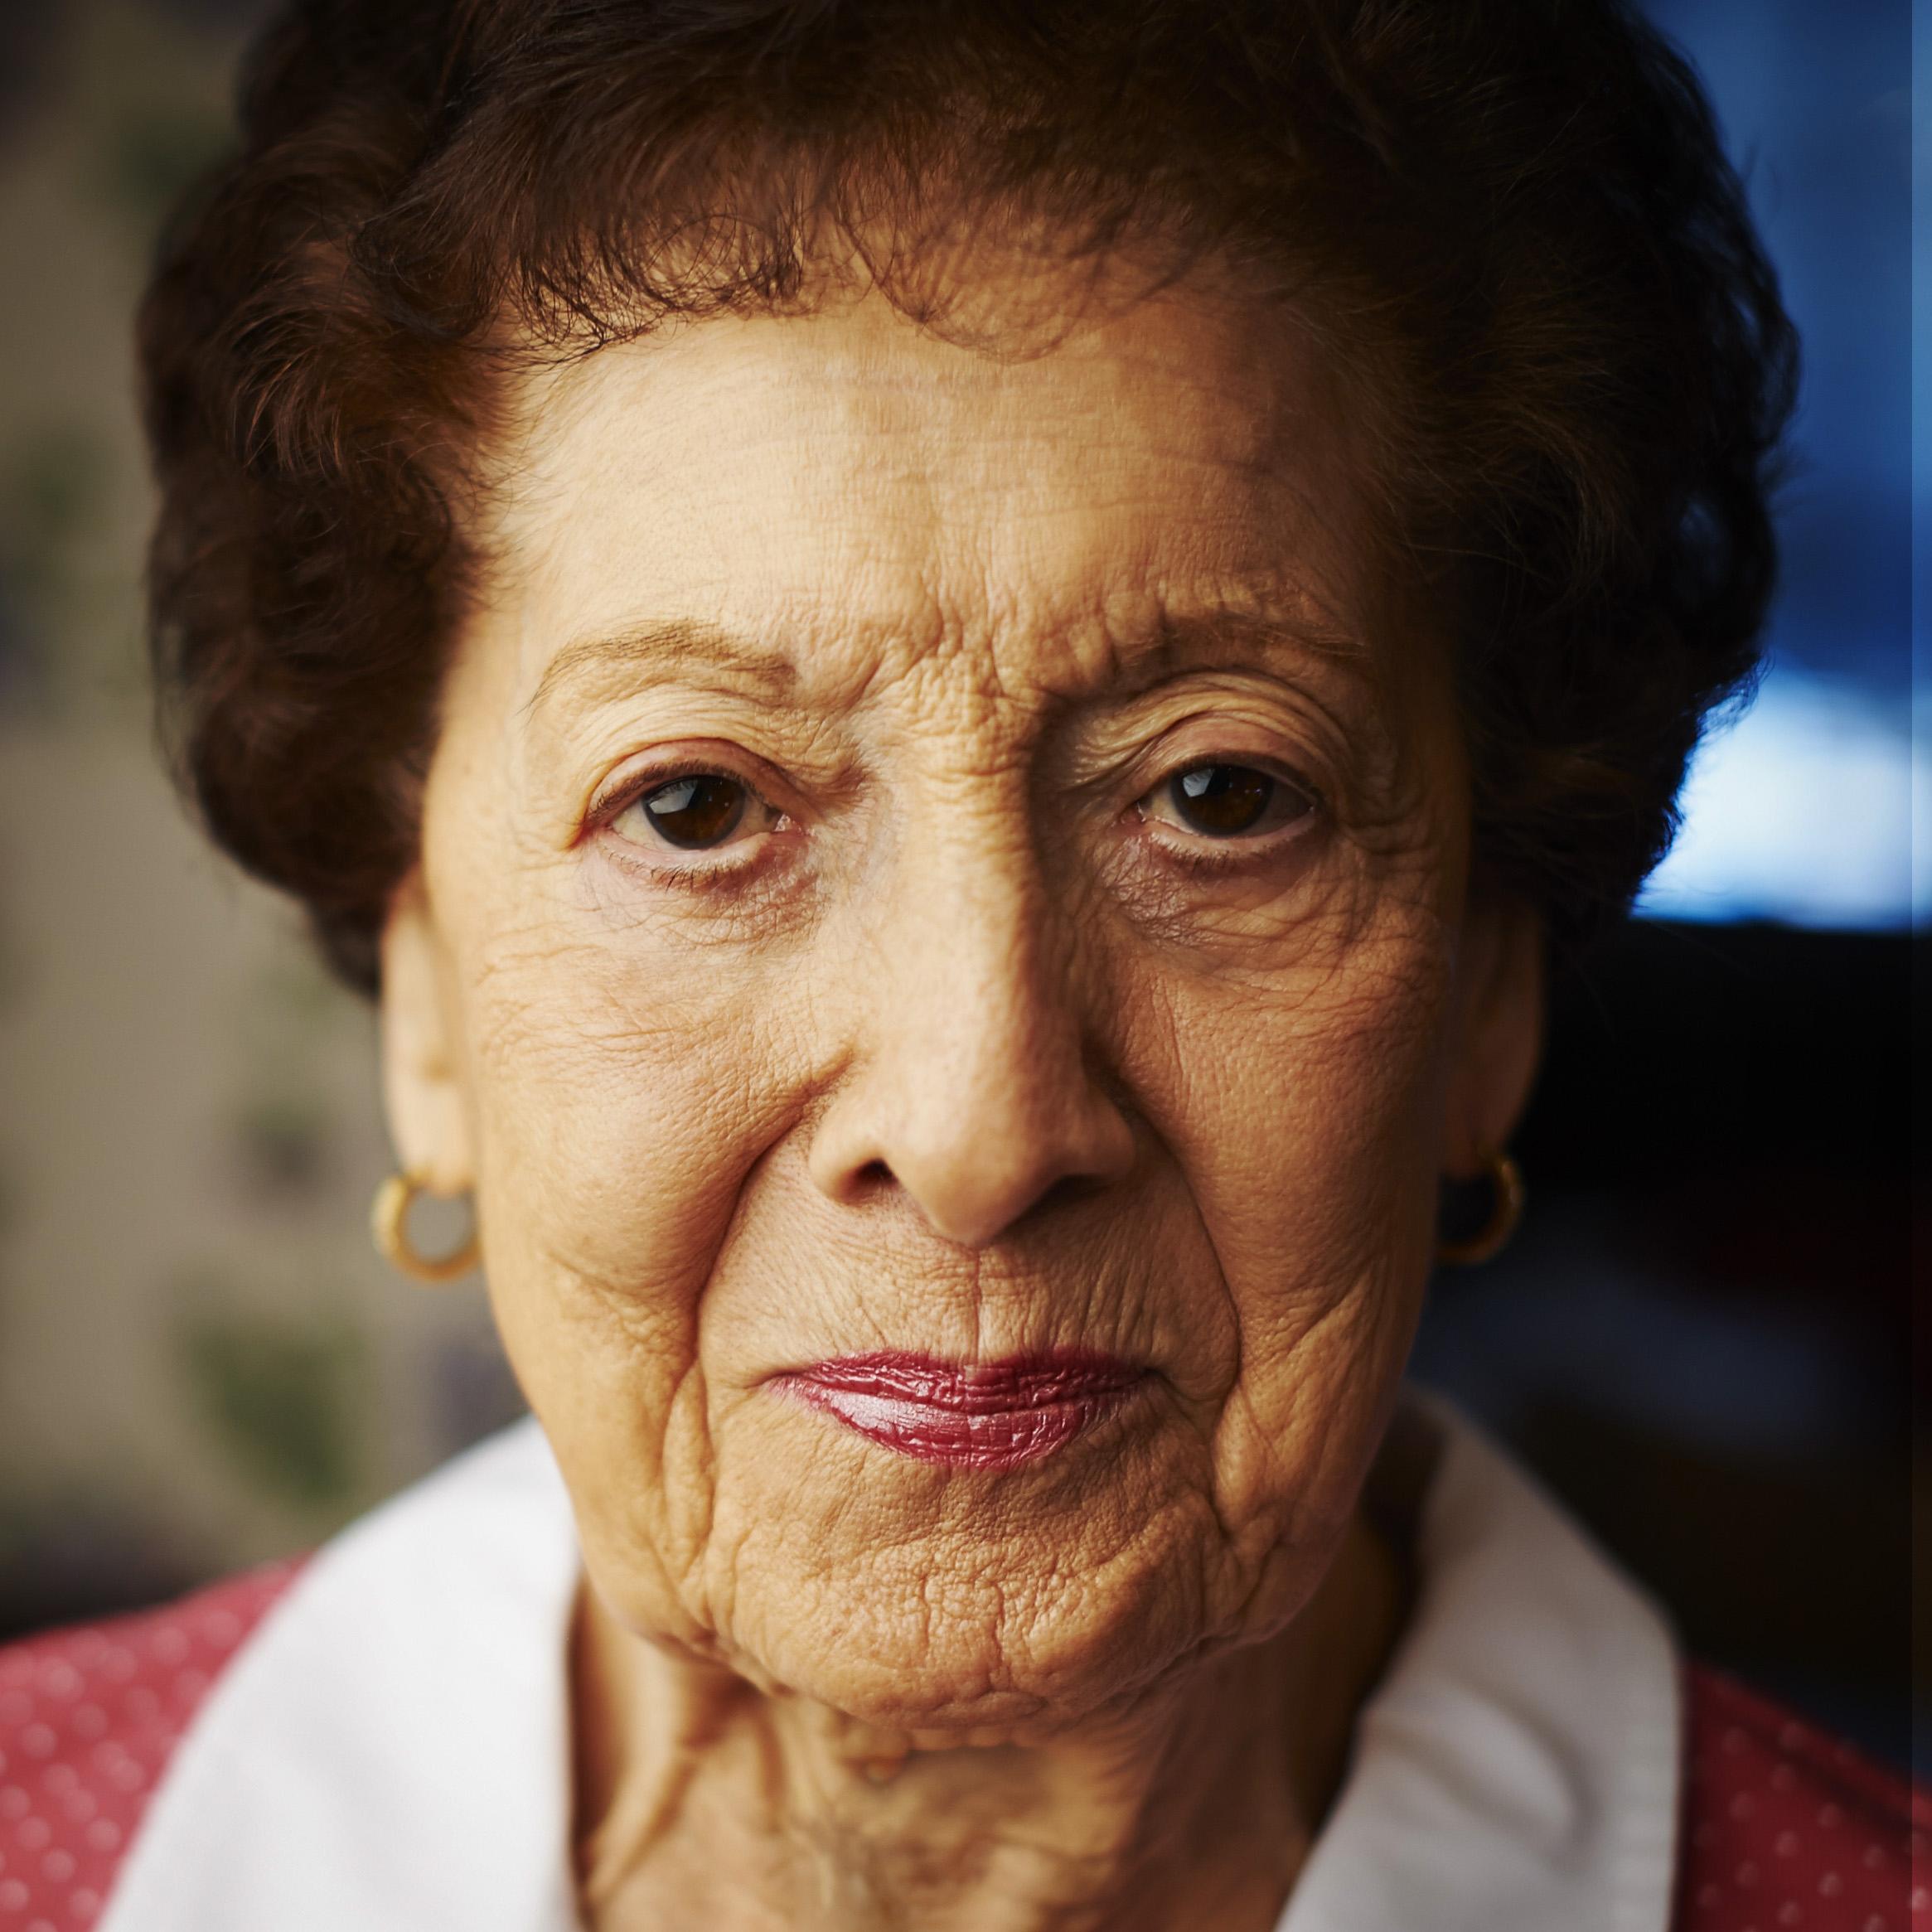 Adelaide Naccarato